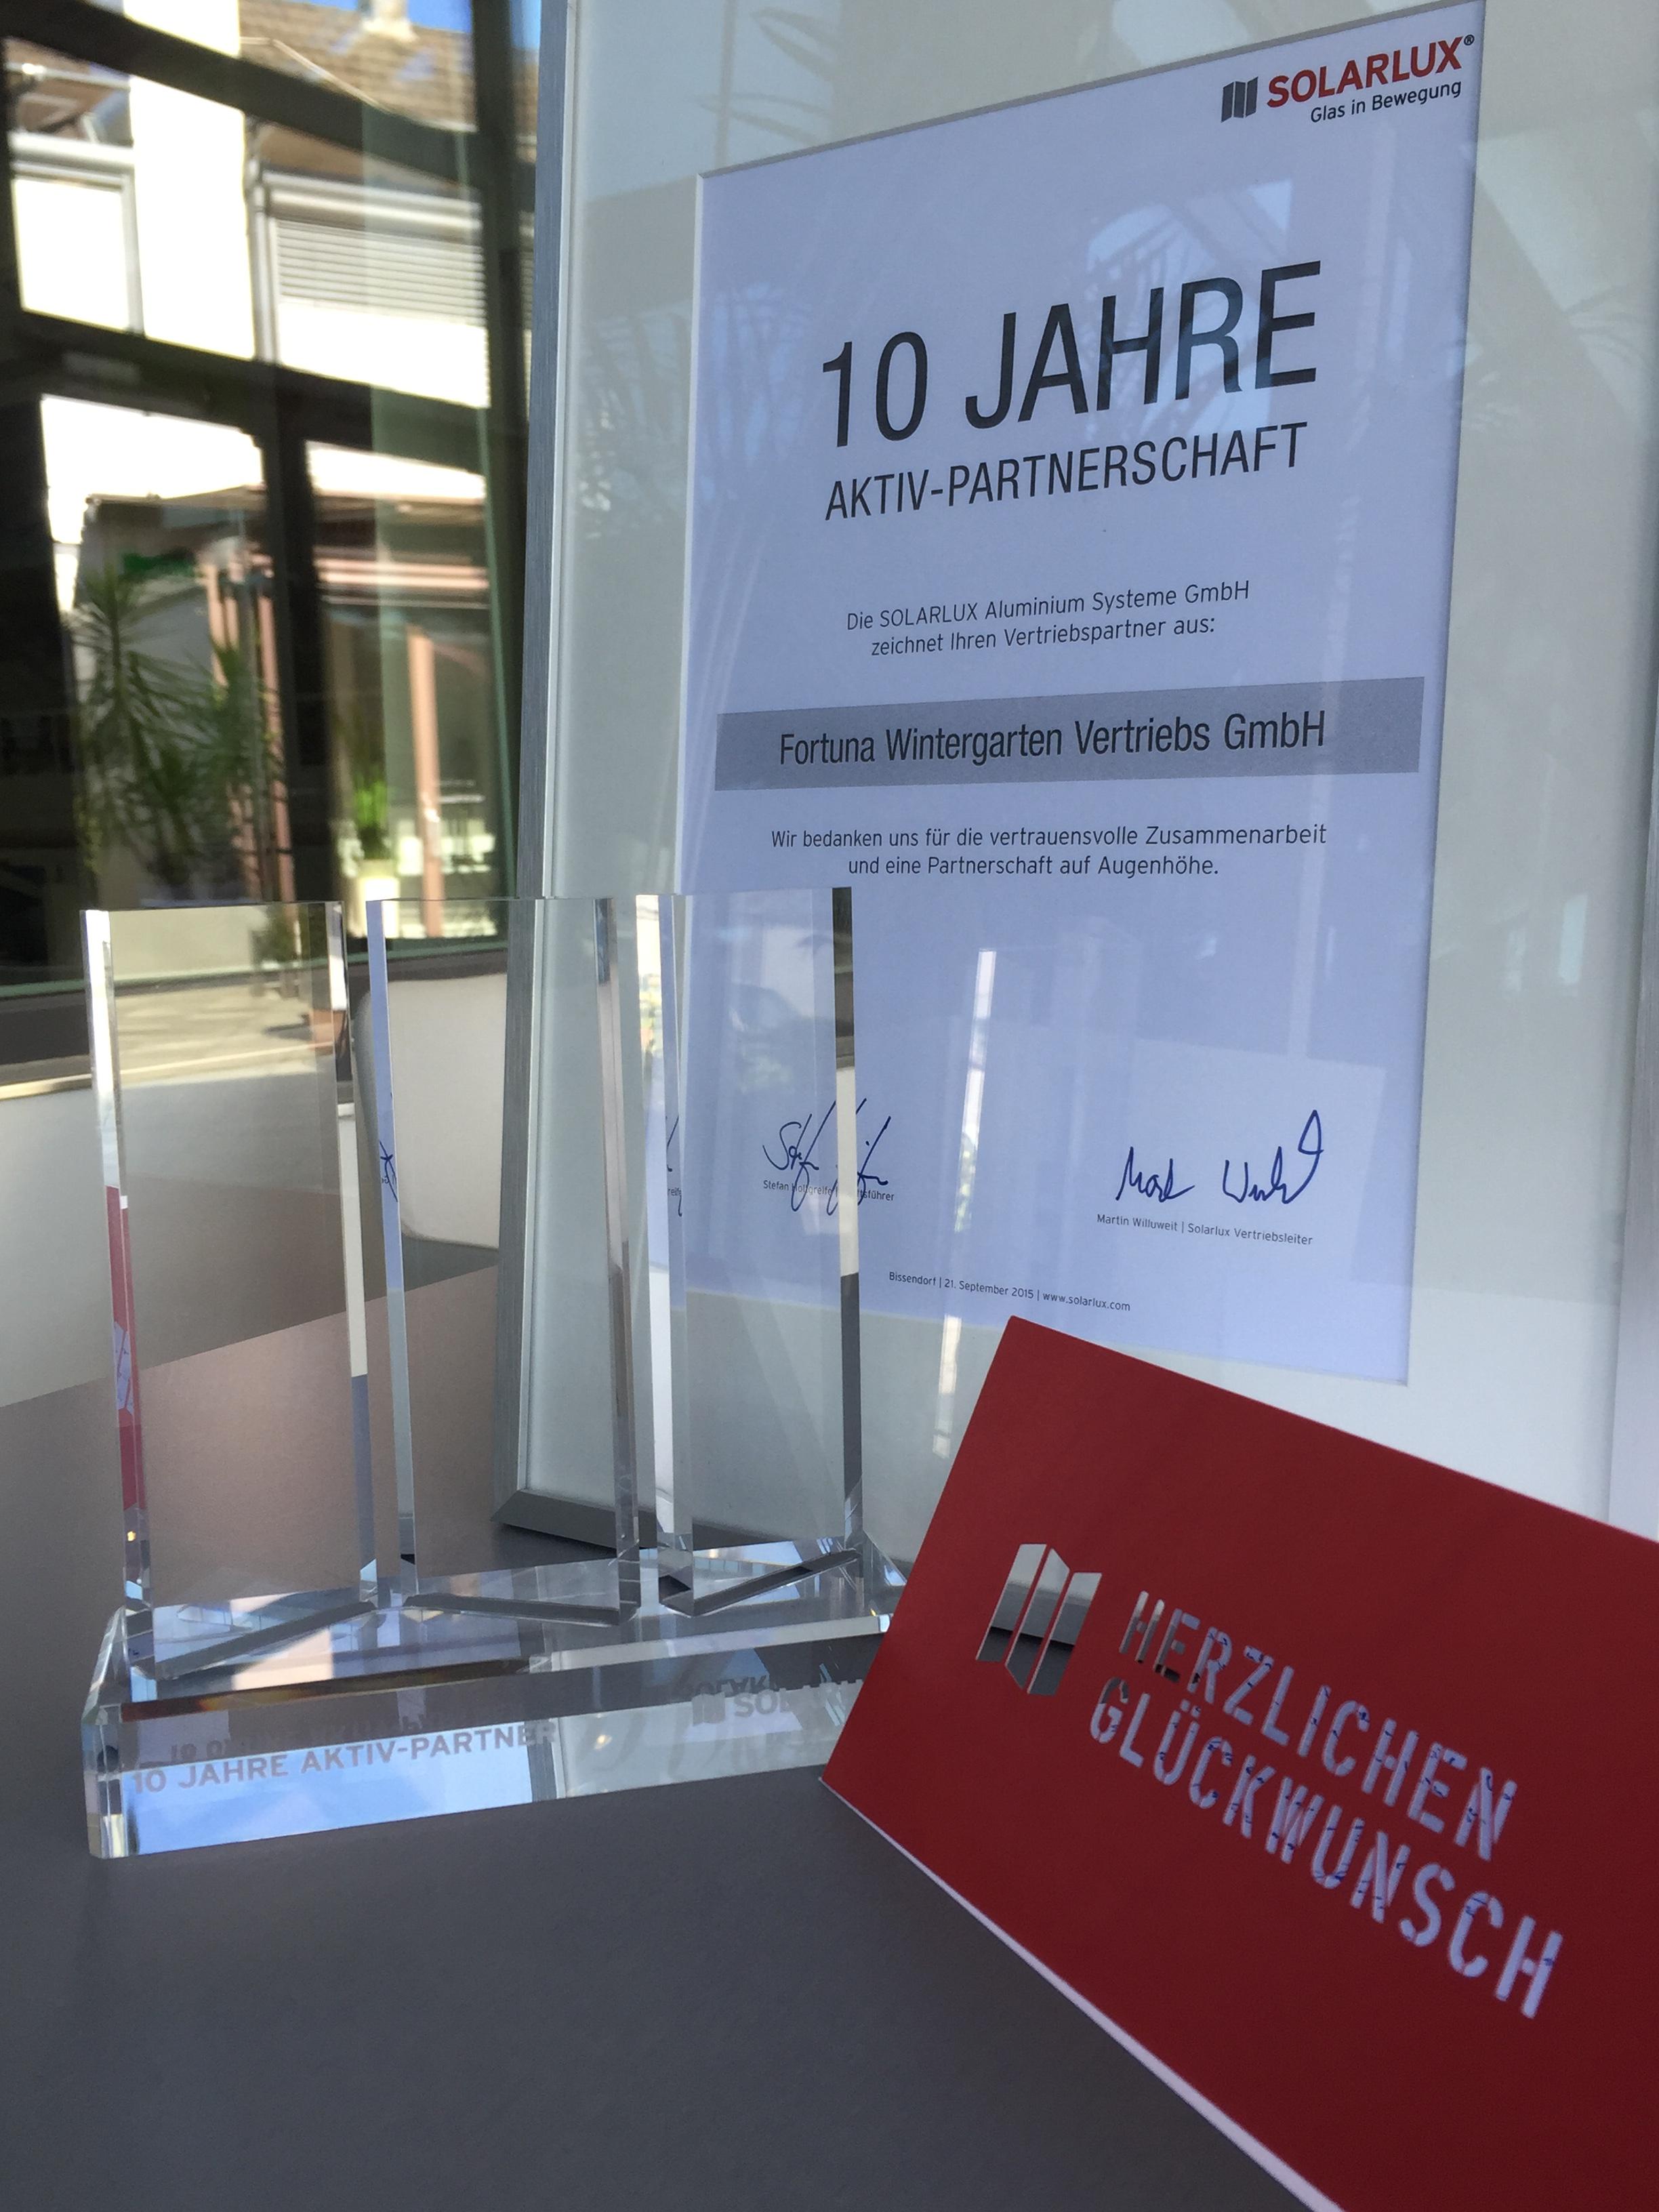 Fortuna Wintgergarten - Fortuna Wintgergarten